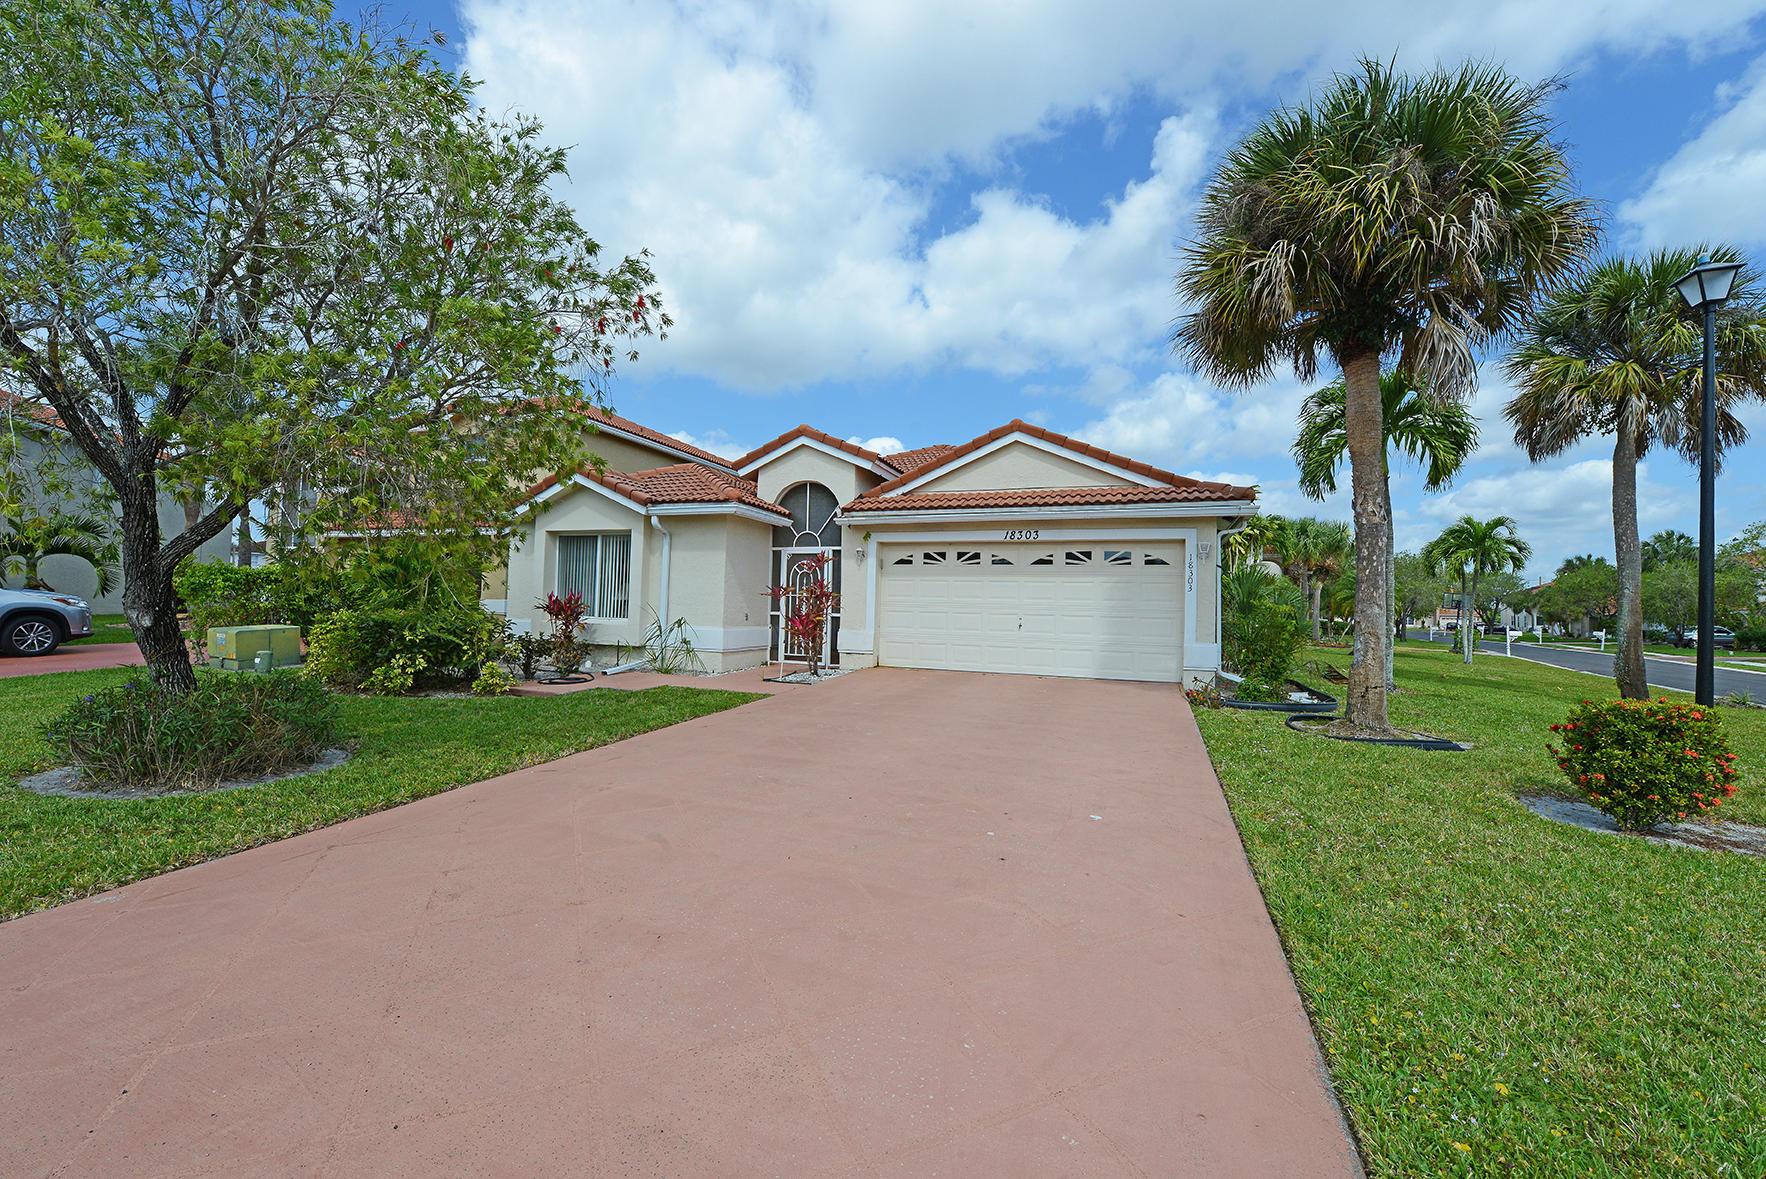 18303 Coral Isles Drive  Boca Raton, FL 33498